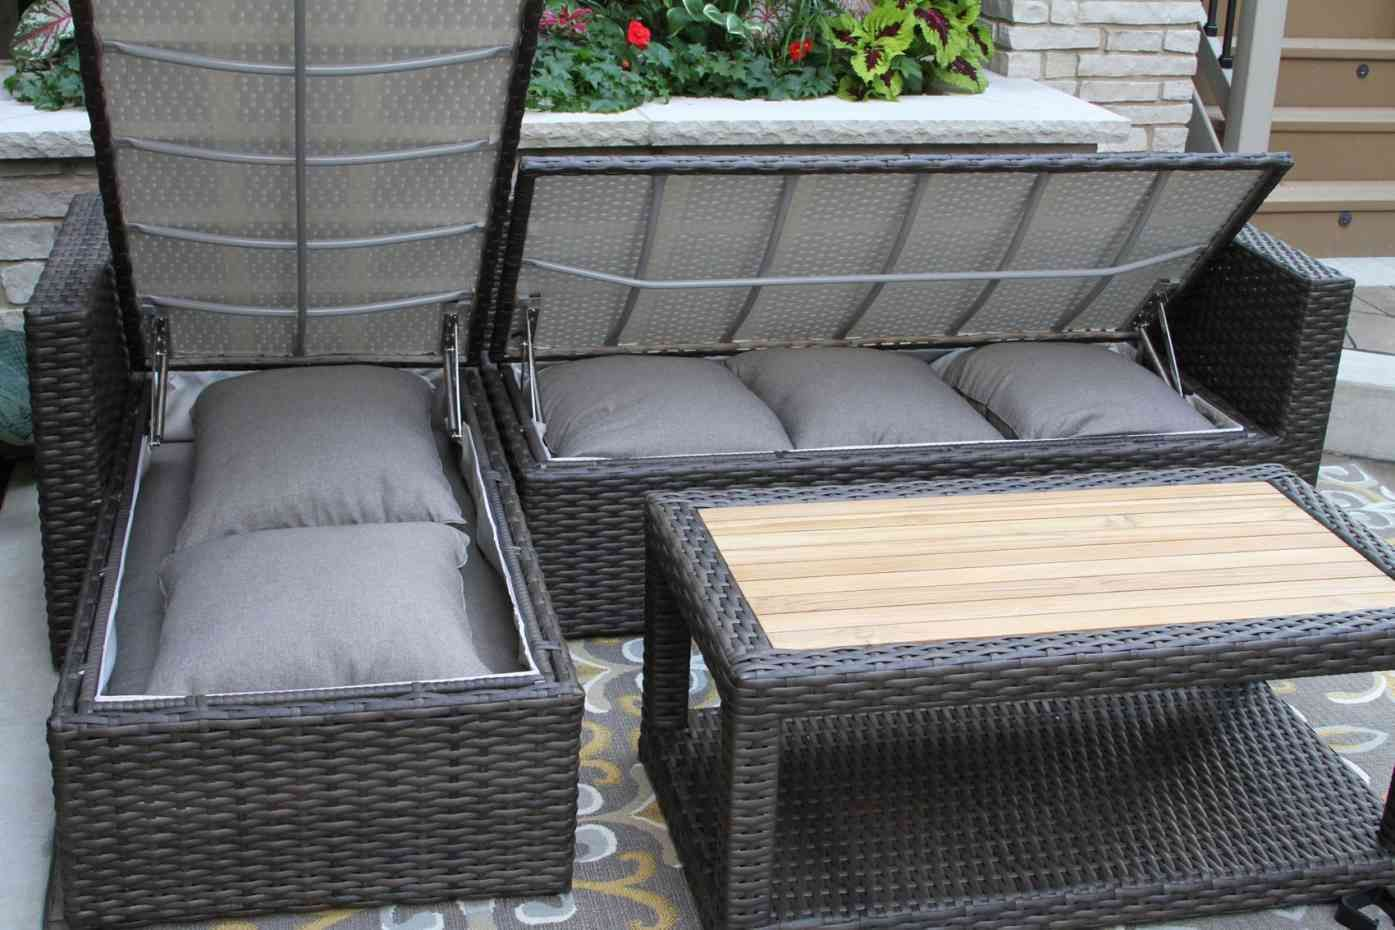 3pc Teak Brown Wicker Sectional Sofa Set With Waterproof Storage In 2020 Patio Sofa Set Patio Cushion Storage Waterproof Outdoor Furniture